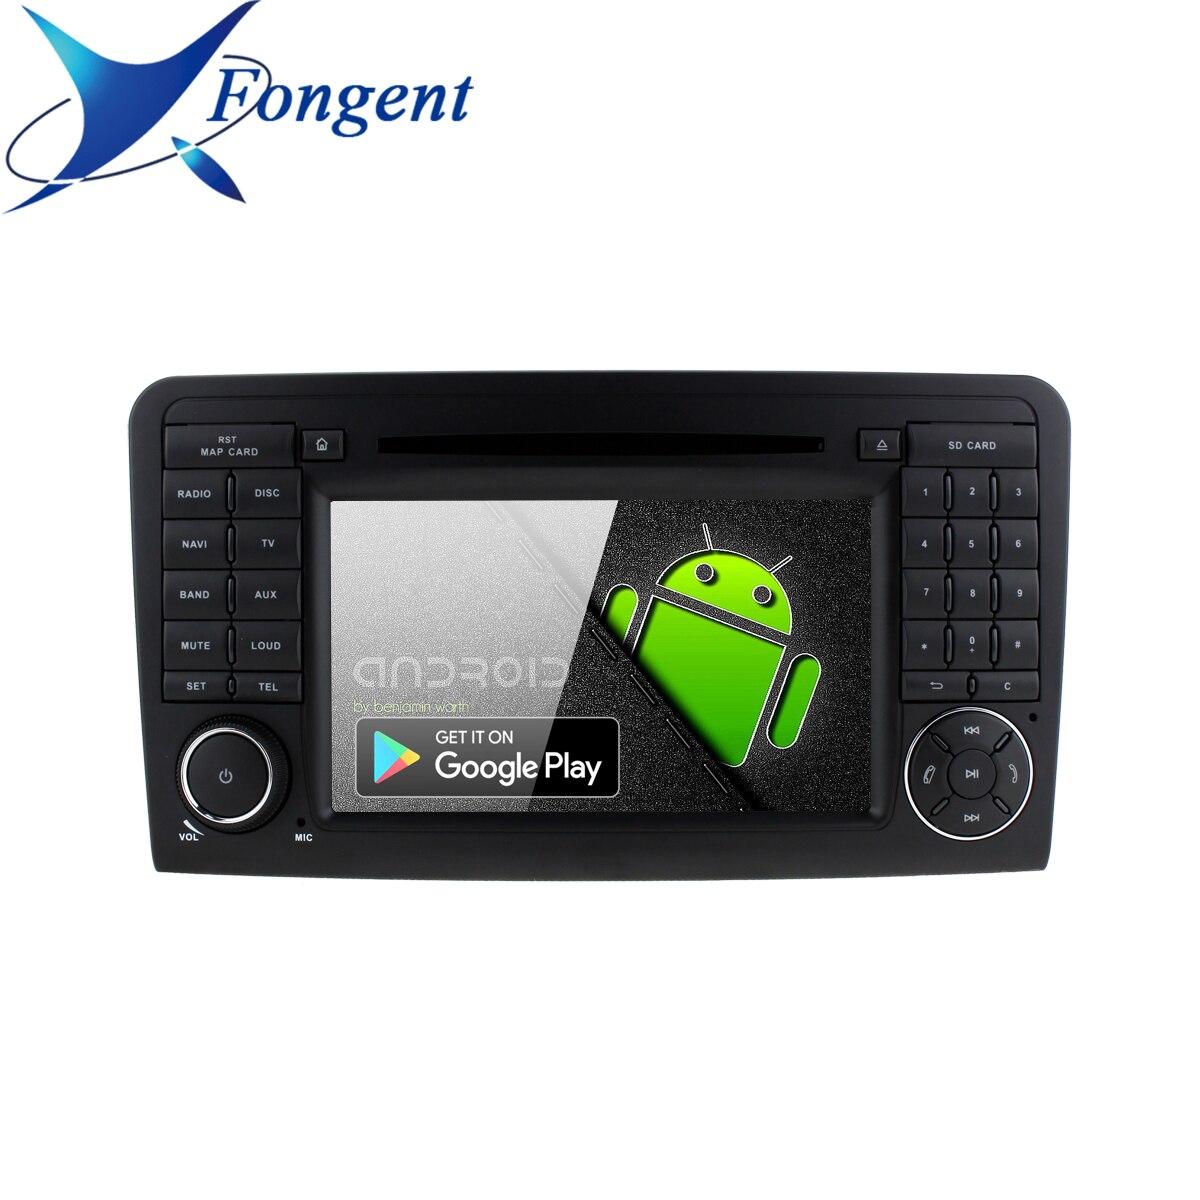 Android reproductor de DVD para Mercedes Benz ML300 ML320 ML350 ML430 ML450 ML500 ML550 ML55 ML63 AMG Radio de coche GPS RDS Multimedia ESTÉREO